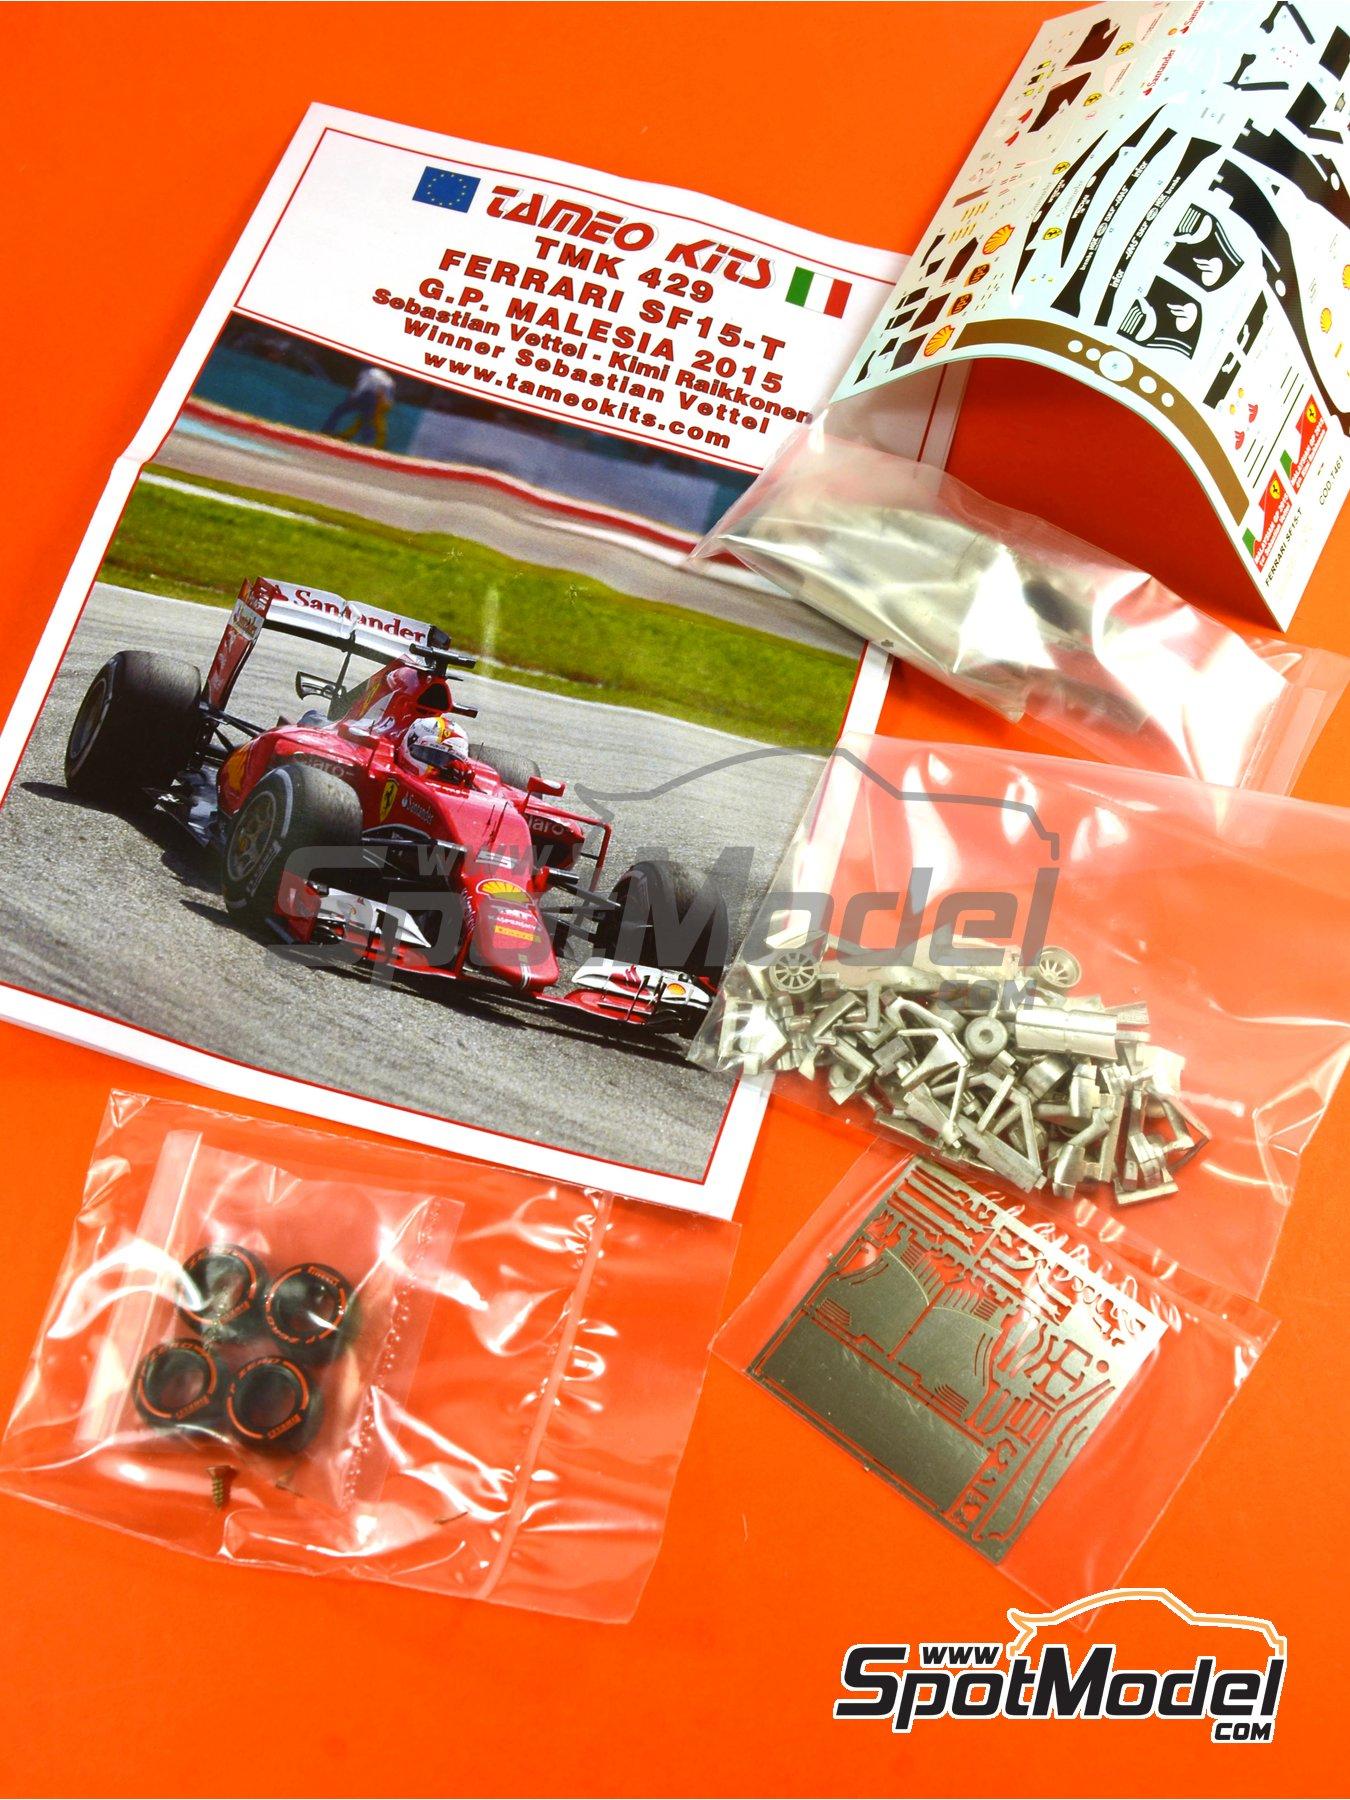 Ferrari SF15-T Shell UPS - Gran Premio de Fórmula 1 de Malasia 2015   Maqueta de coche en escala1/43 fabricado por Tameo Kits (ref.TMK429) image